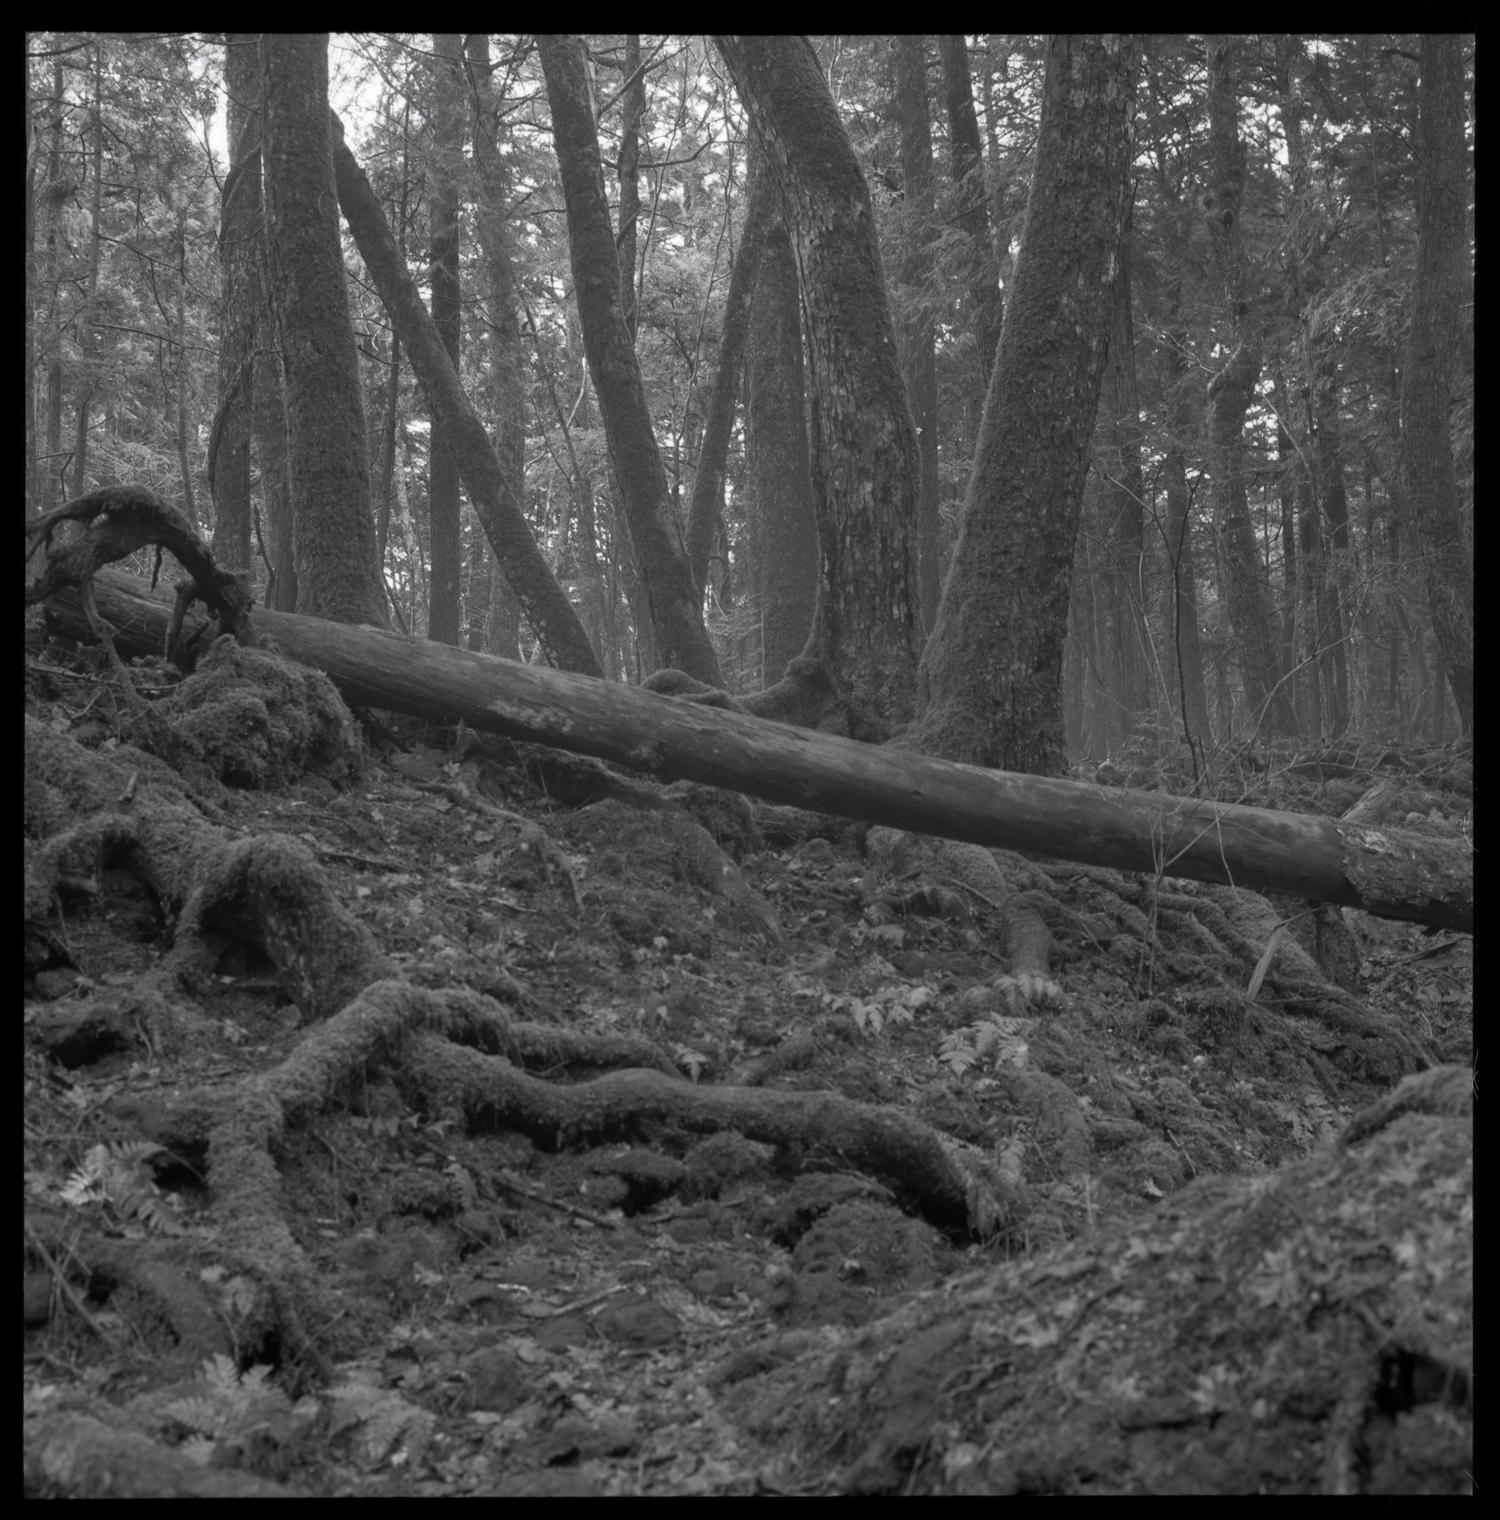 forest-bw-15.jpg